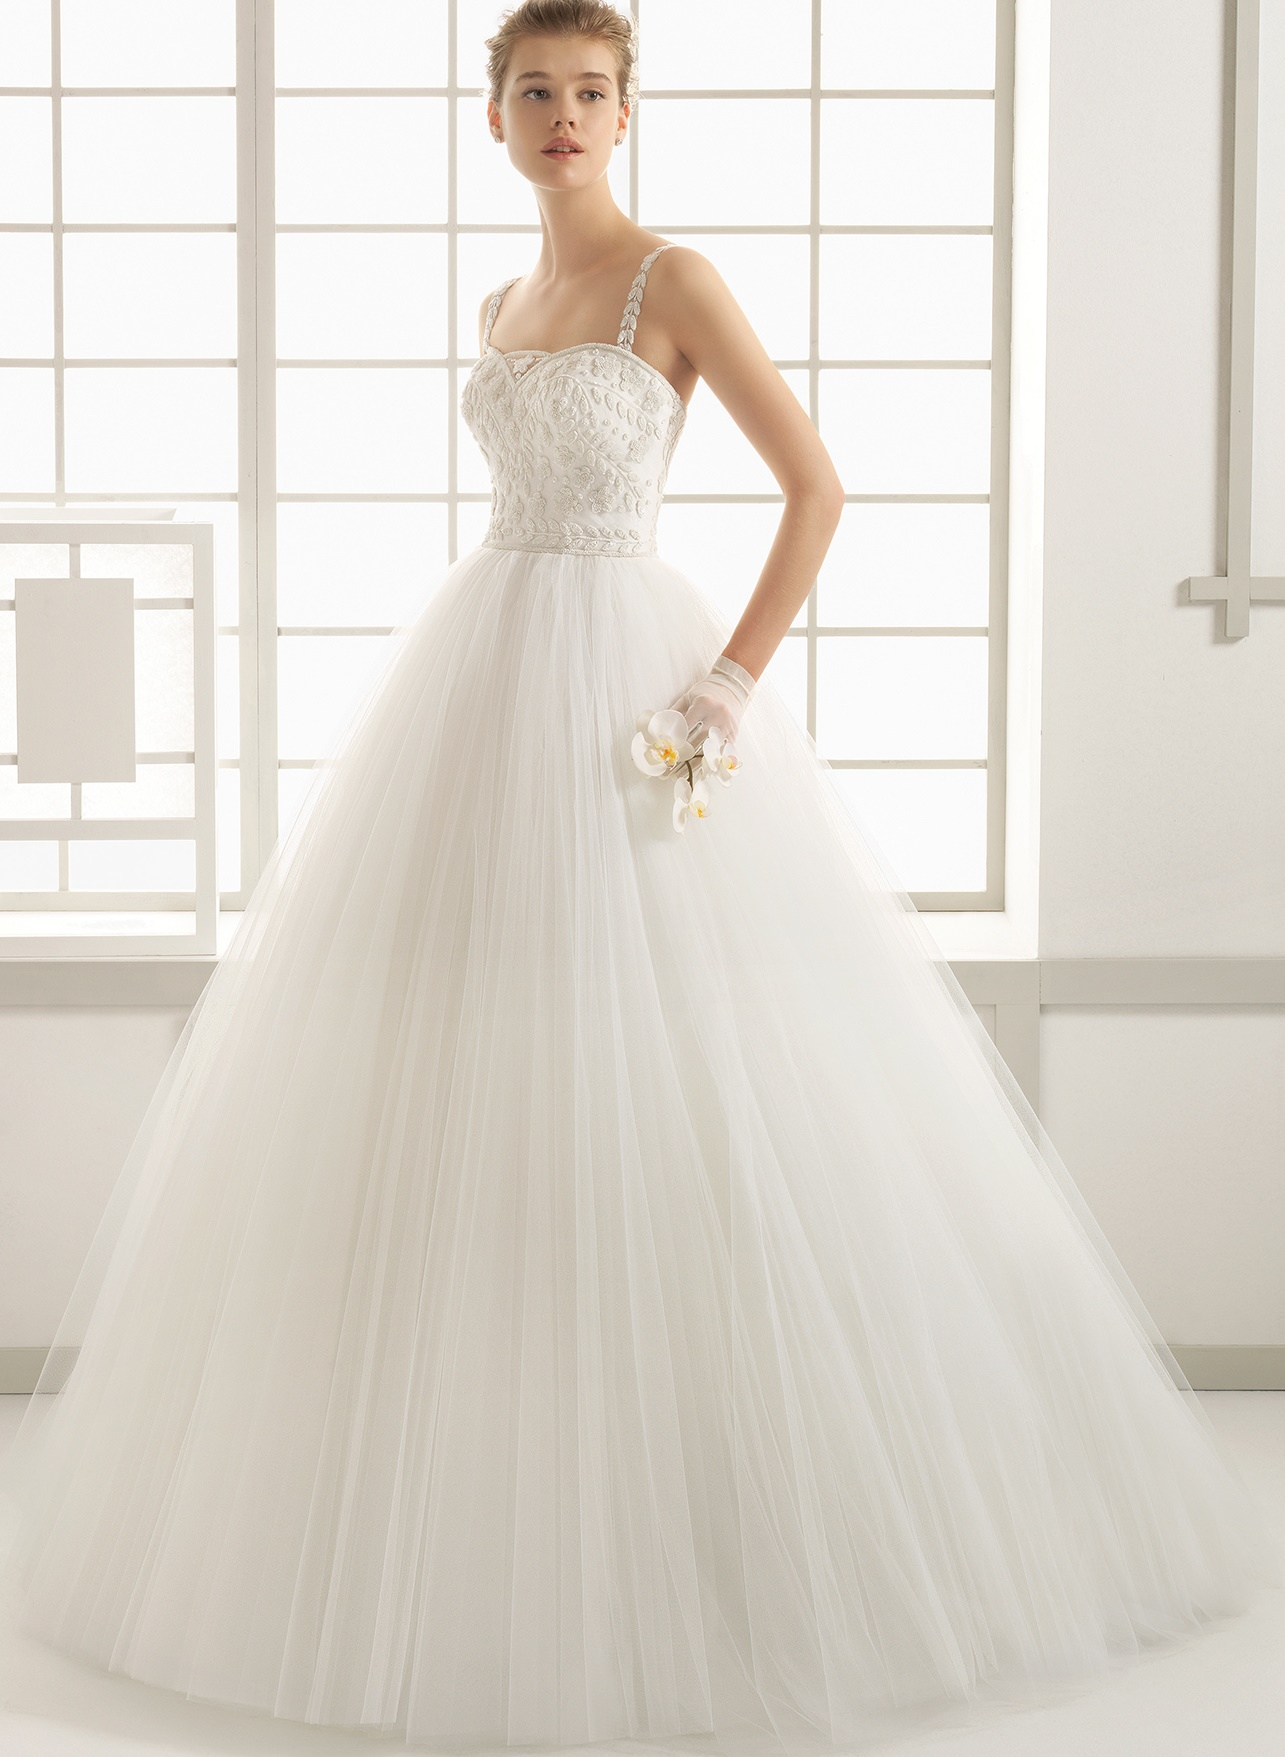 Rosa Clará12 - Vestidos de Noiva - Bridal Collection 2016